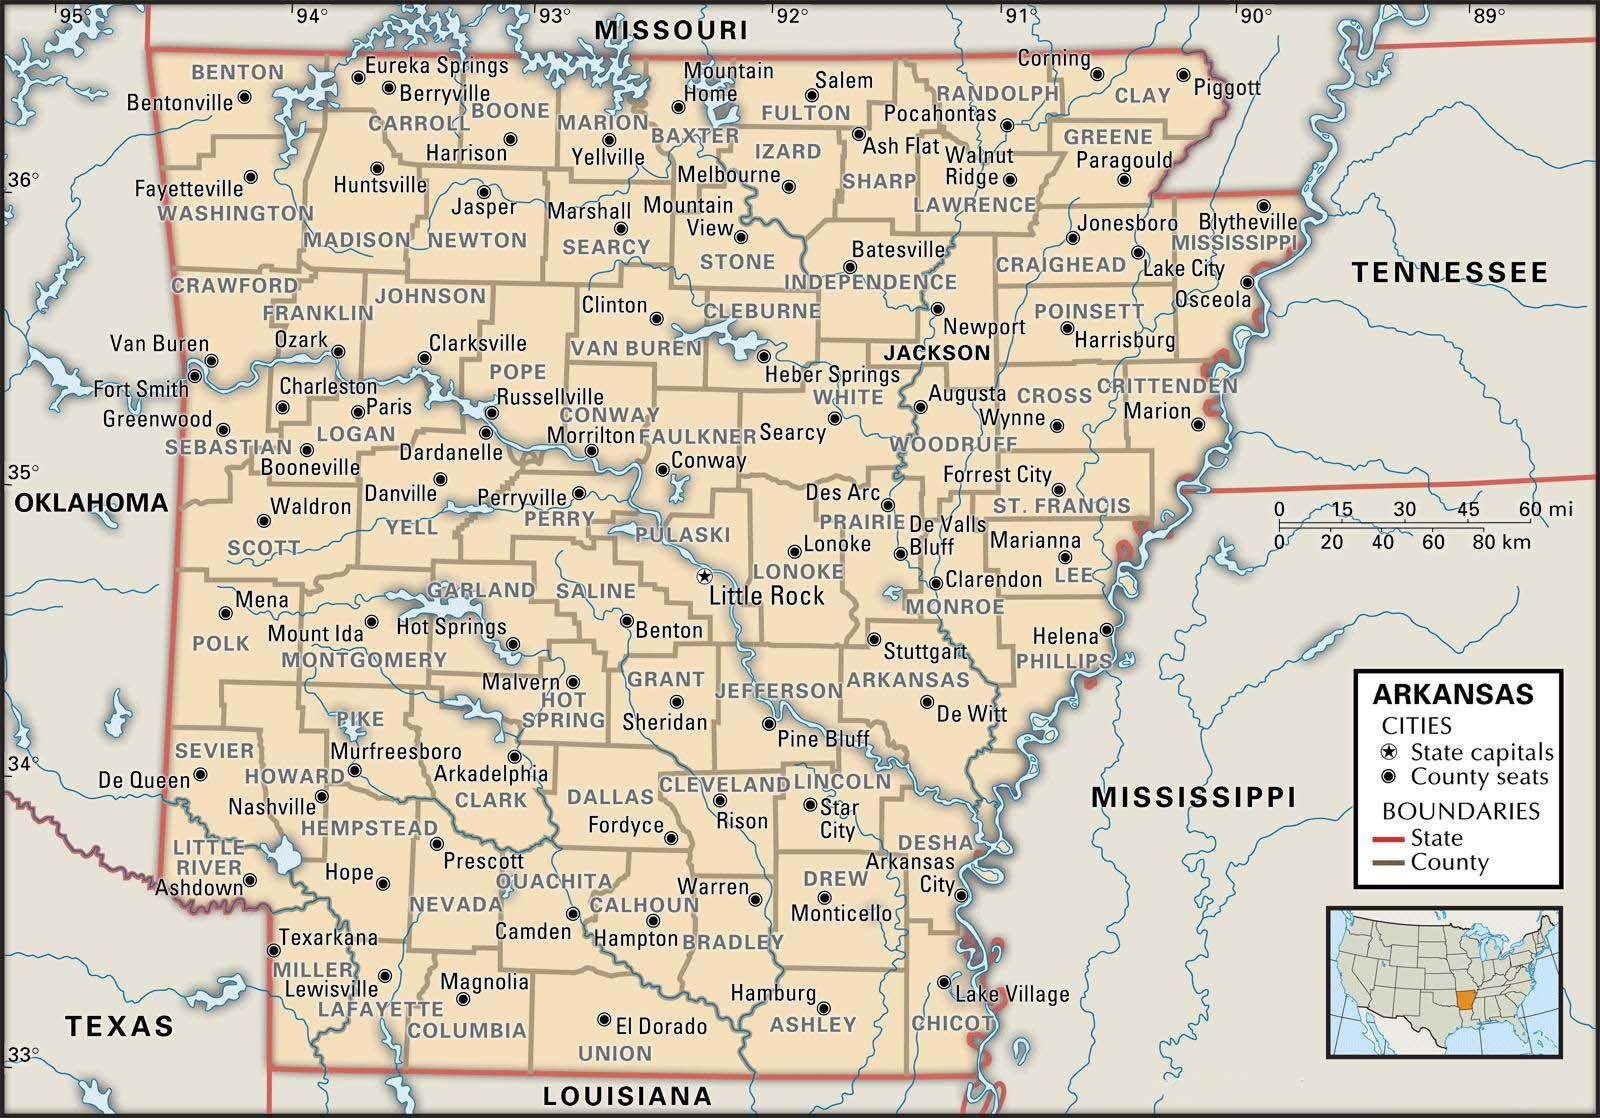 Arkansas Atlas Map Map Of Arkansas County Boundaries And